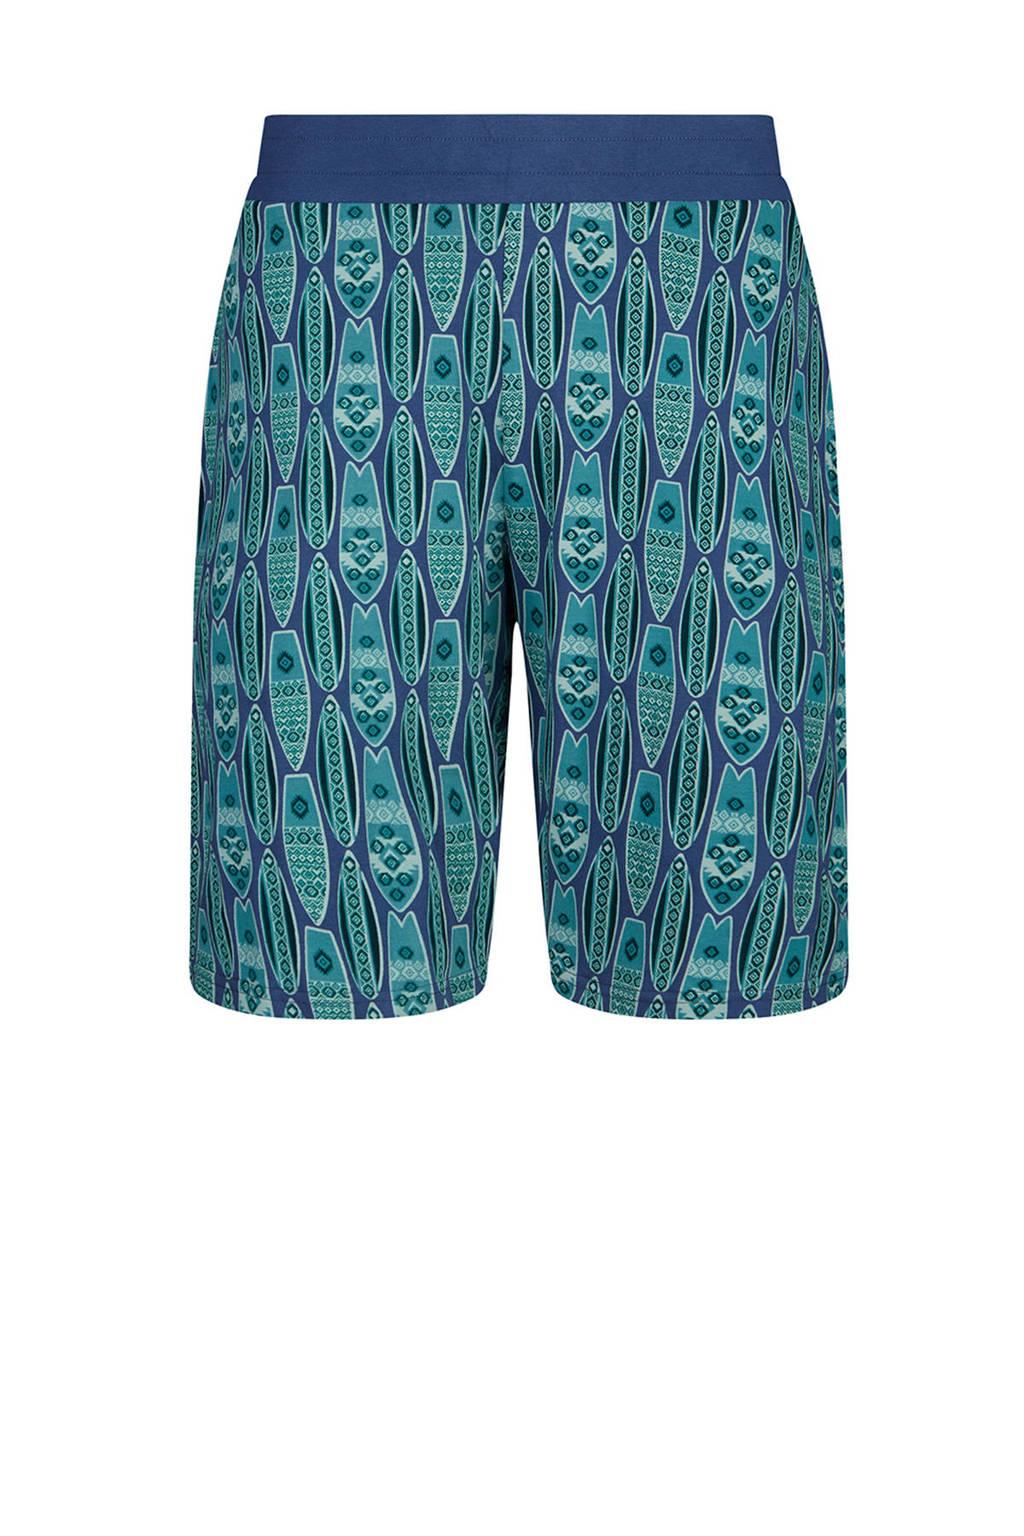 Charlie Choe pyjamashort met all over print blauw, Blauw/groen